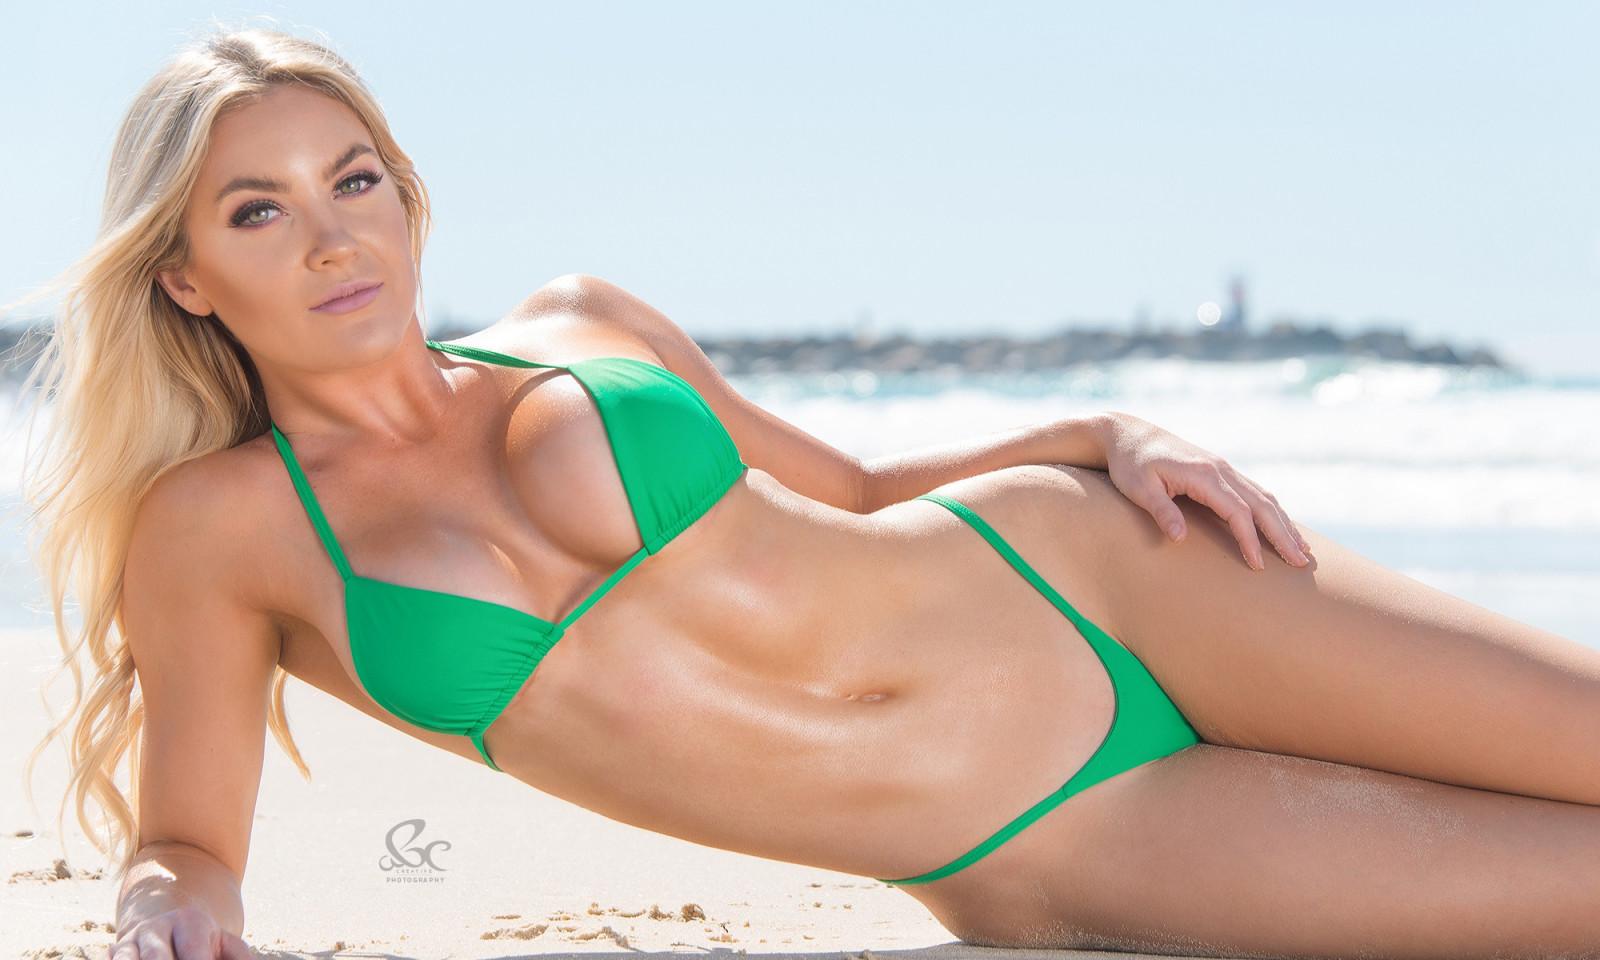 Green bikini girl wallpaper, hot babe nude having sex